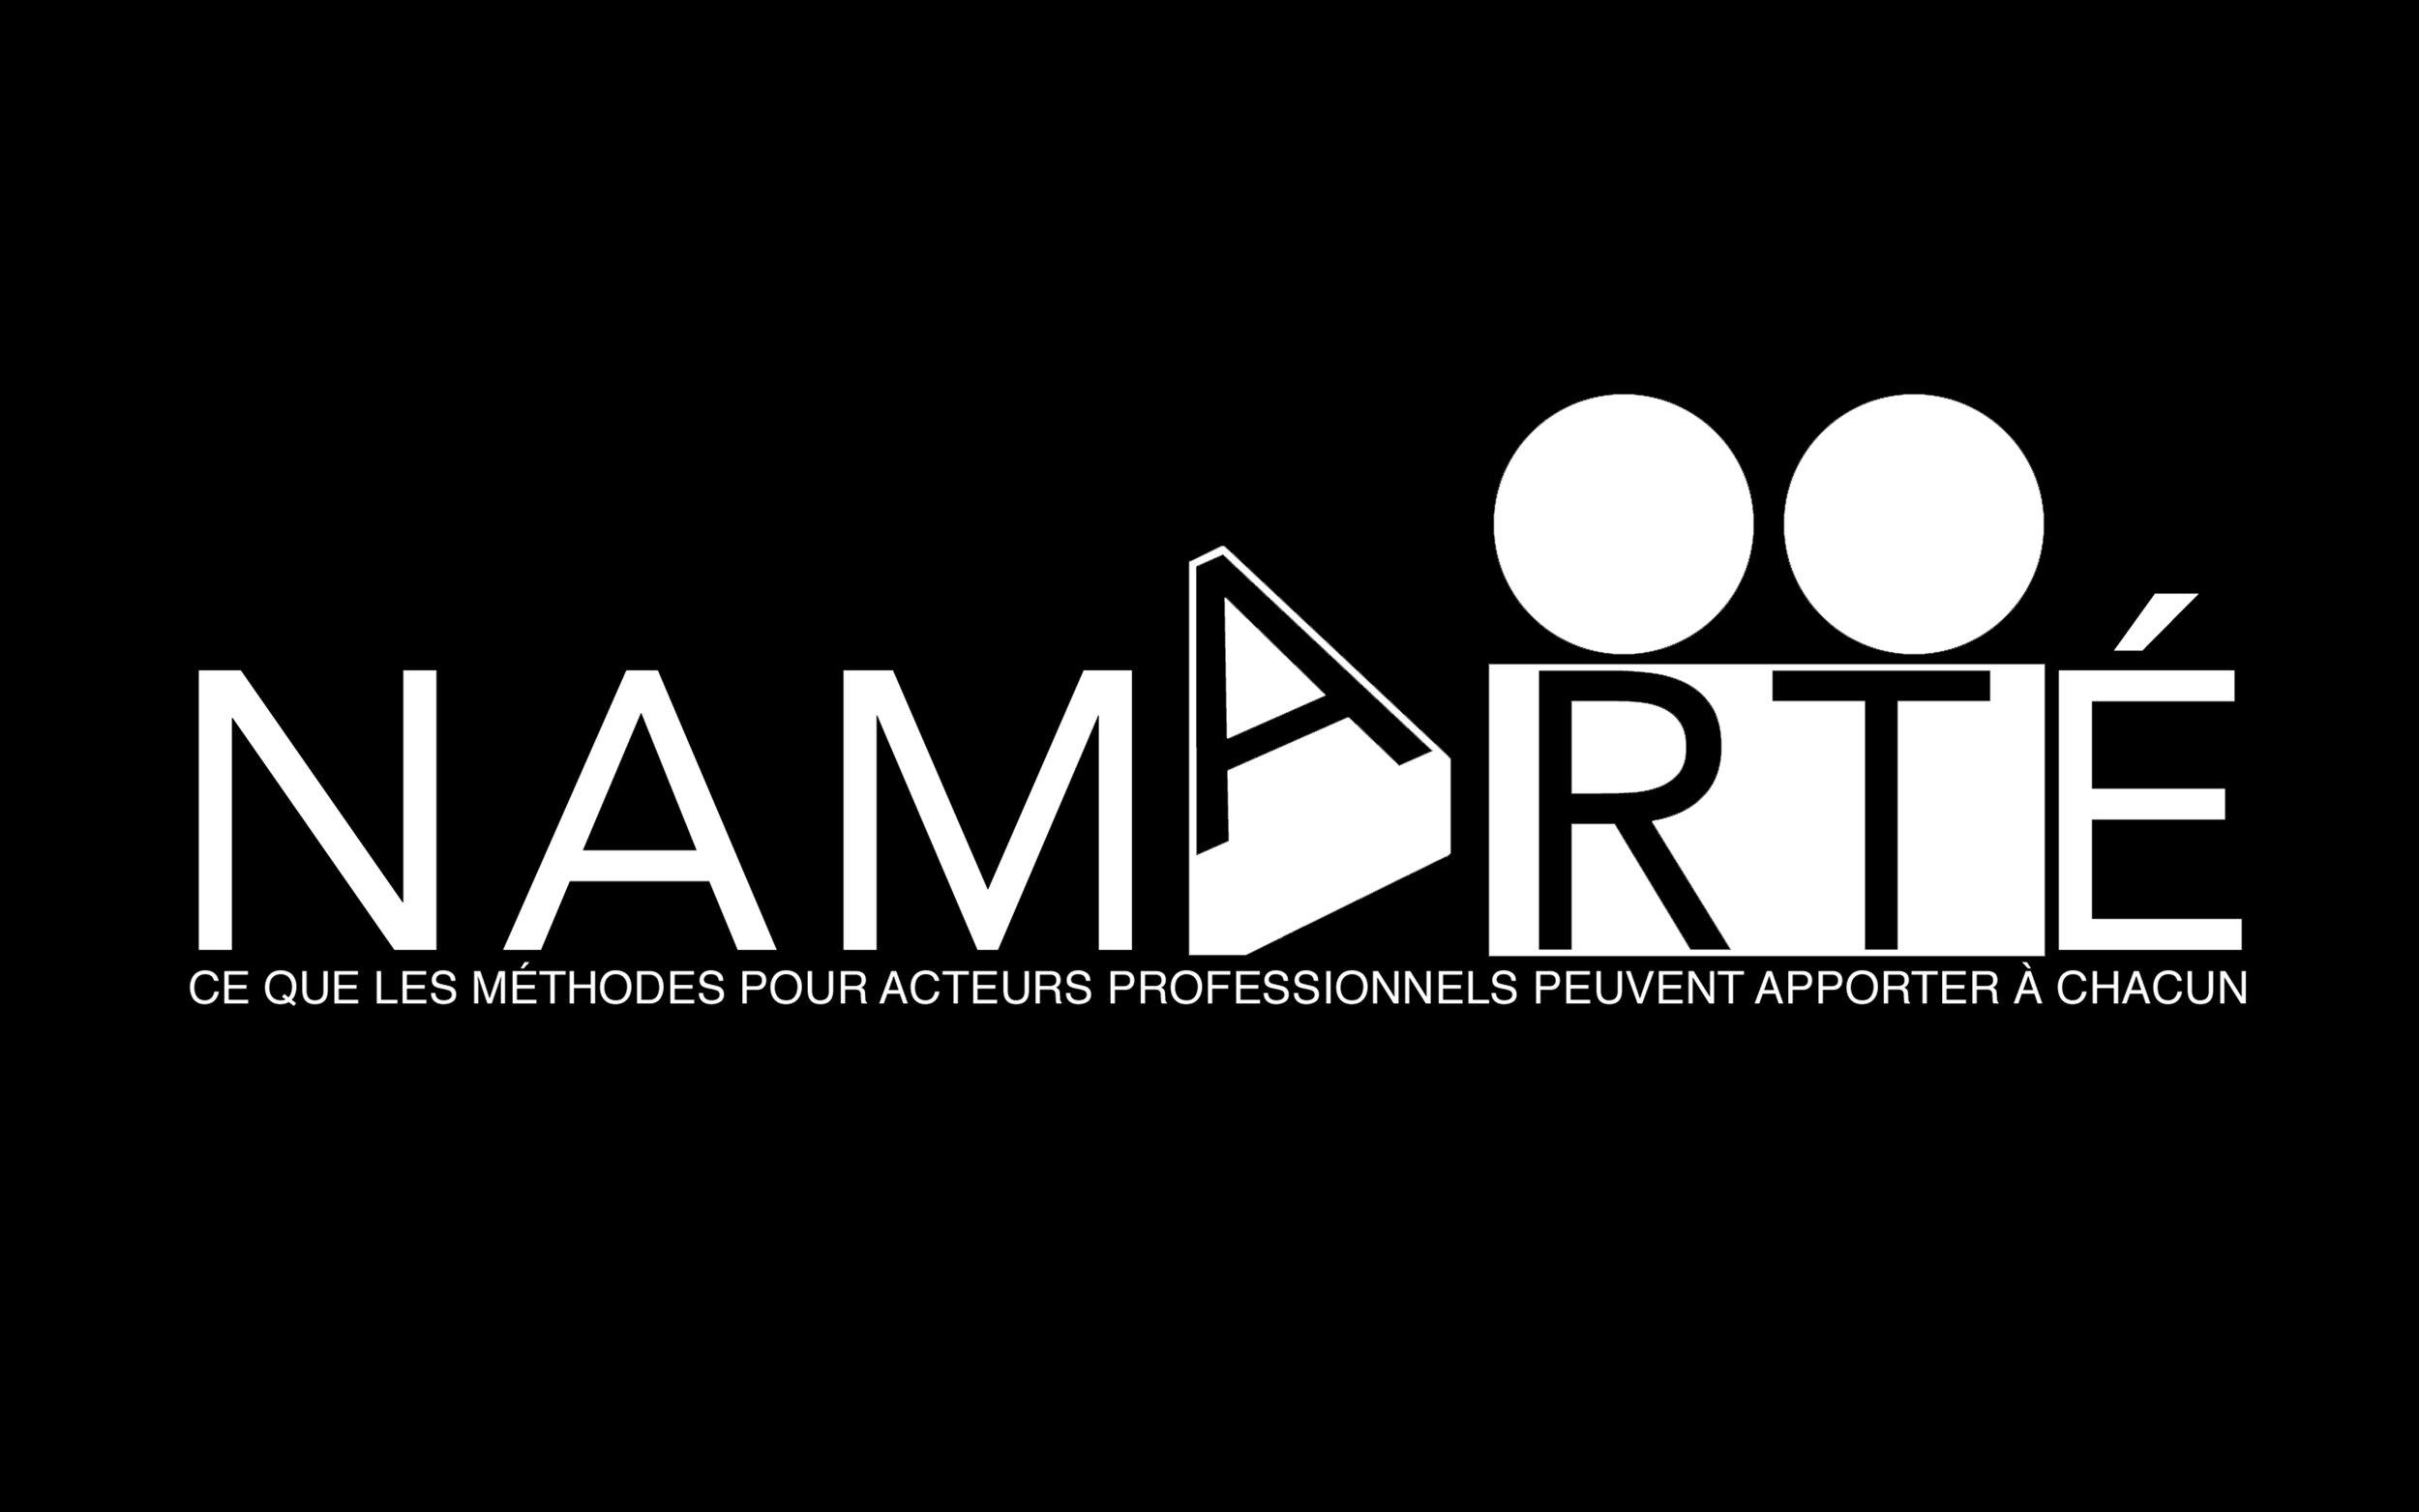 logo Namarté hd.jpg